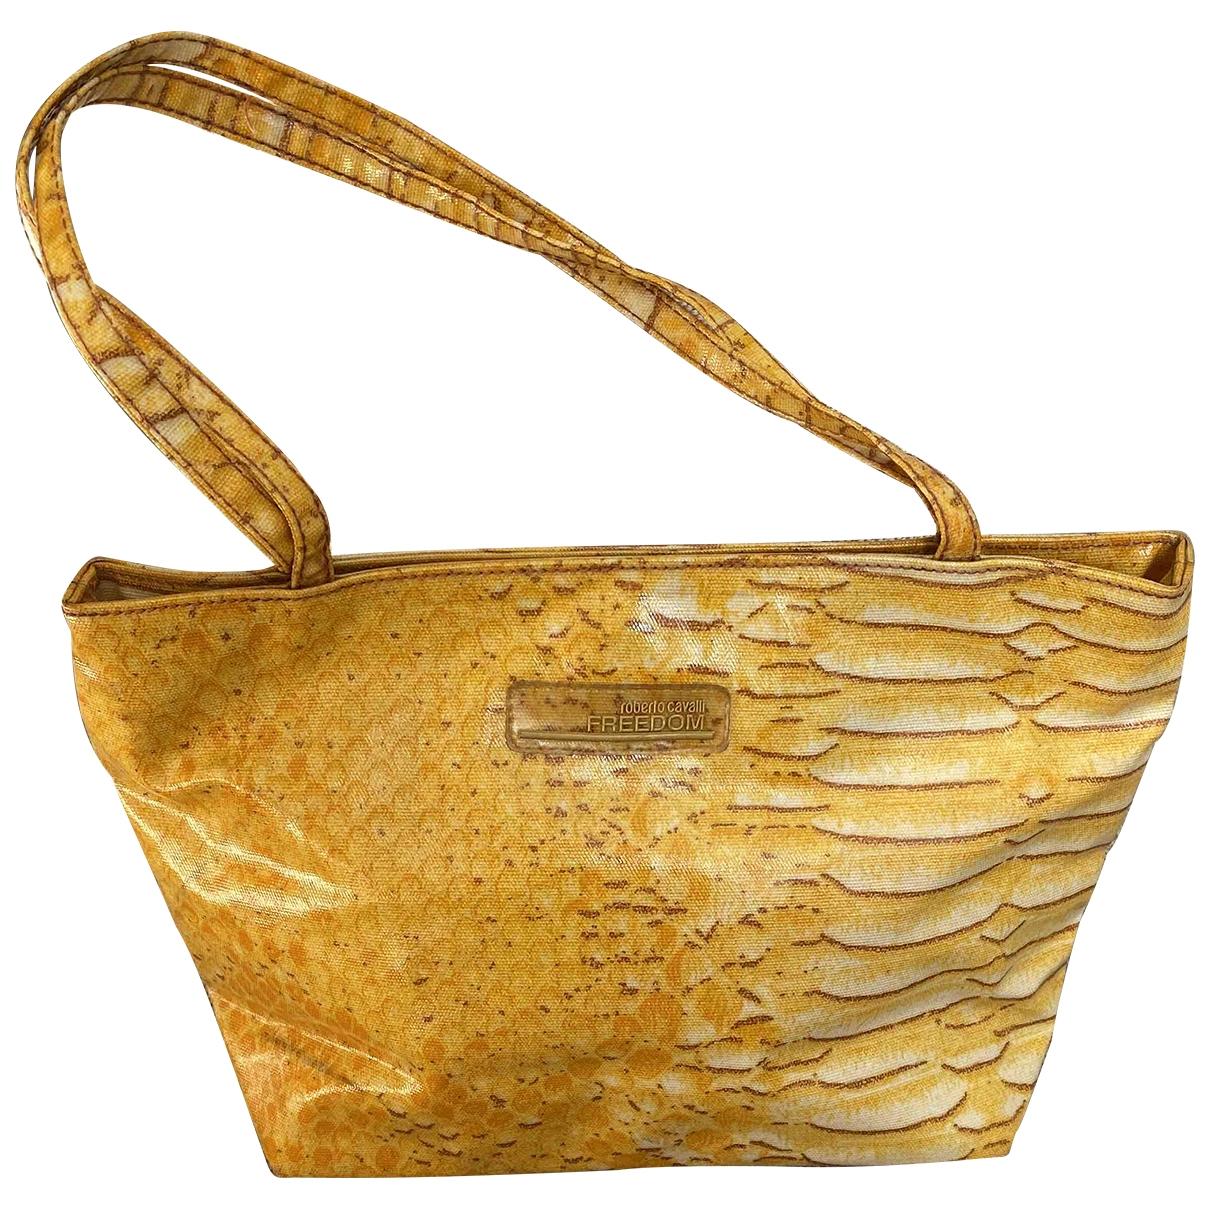 Roberto Cavalli \N Handtasche in  Gelb Leinen